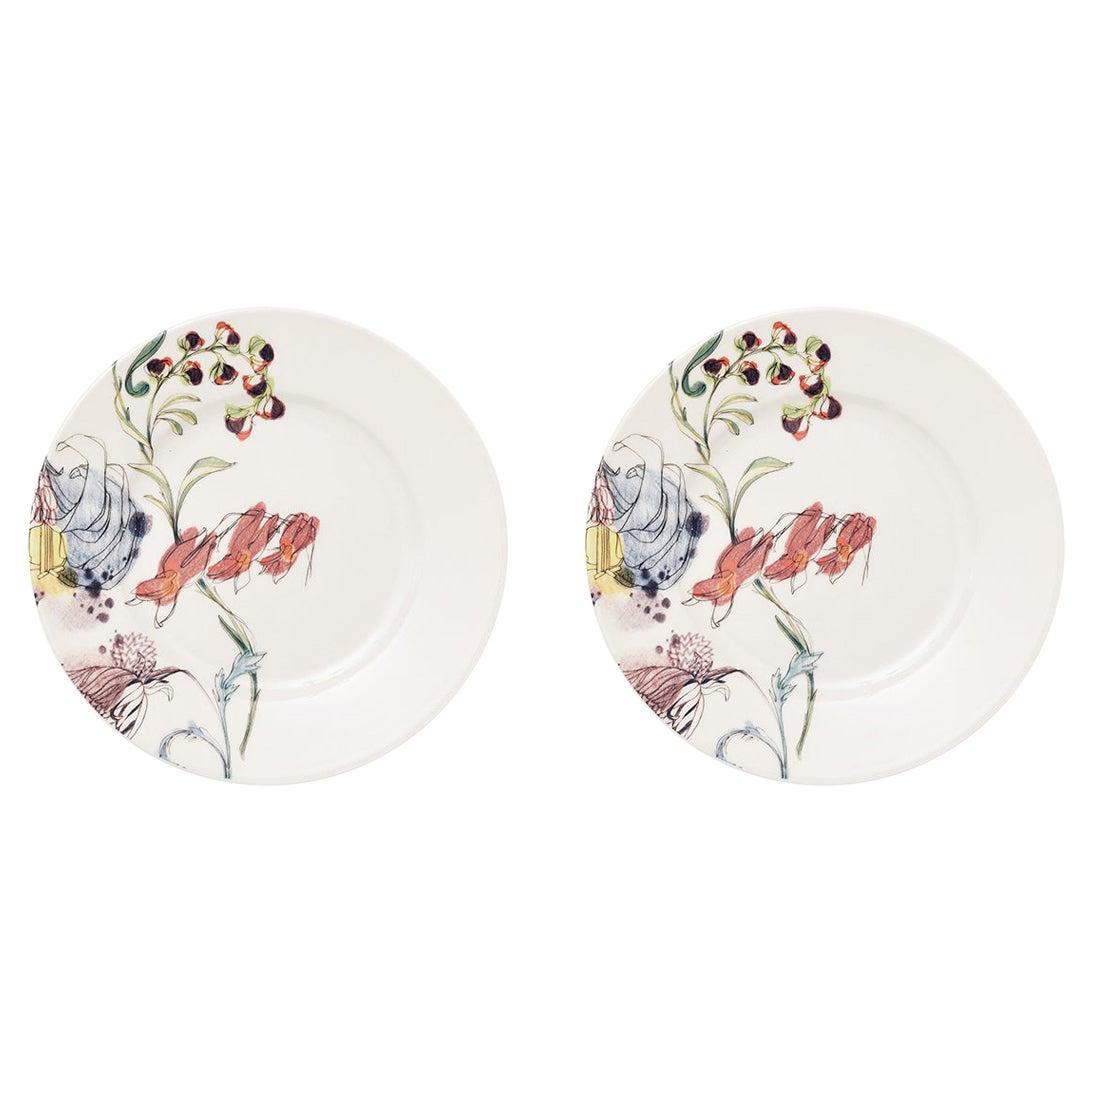 Grandma's Garden, Contemporary Porcelain Dessert Plates Set with Floral Design